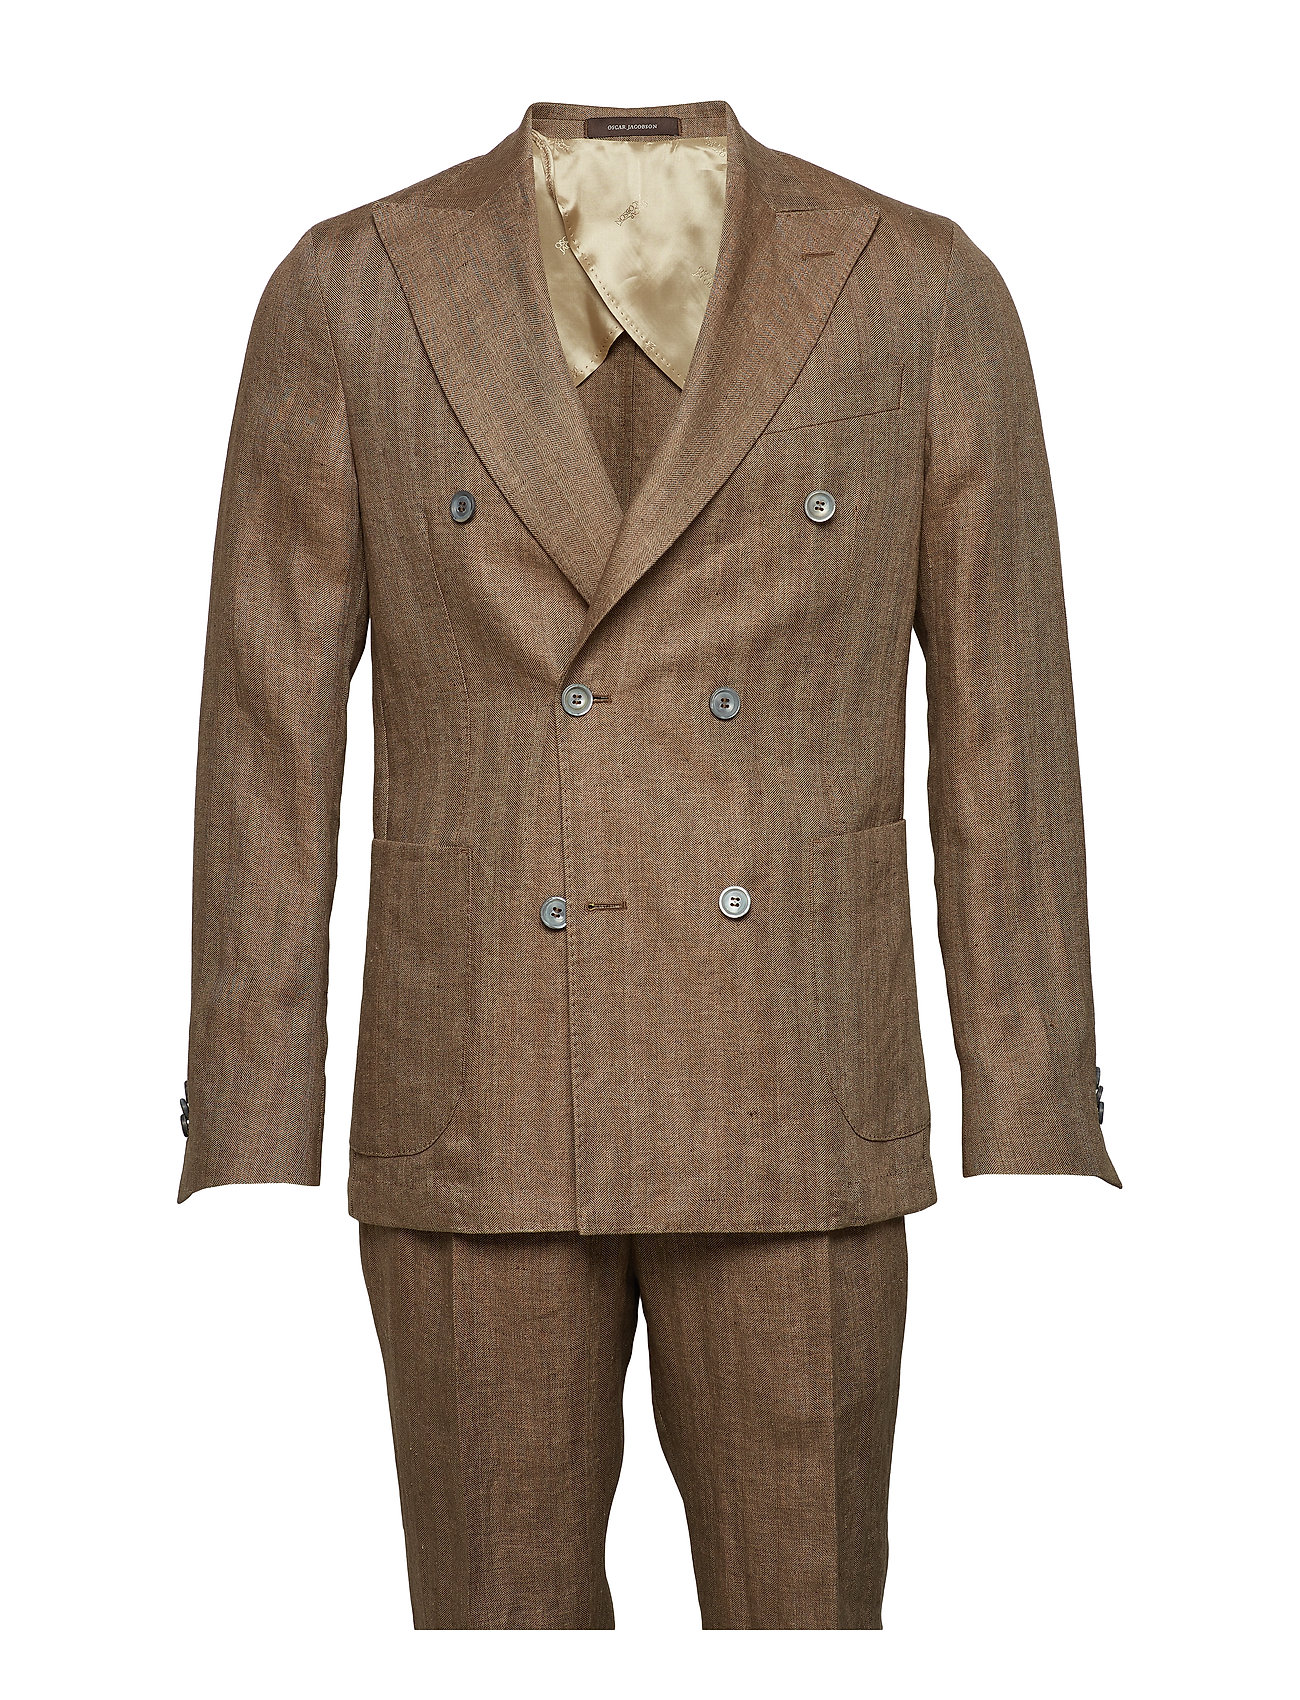 Oscar Jacobson Erik Suit - 583 - CHESTNUT